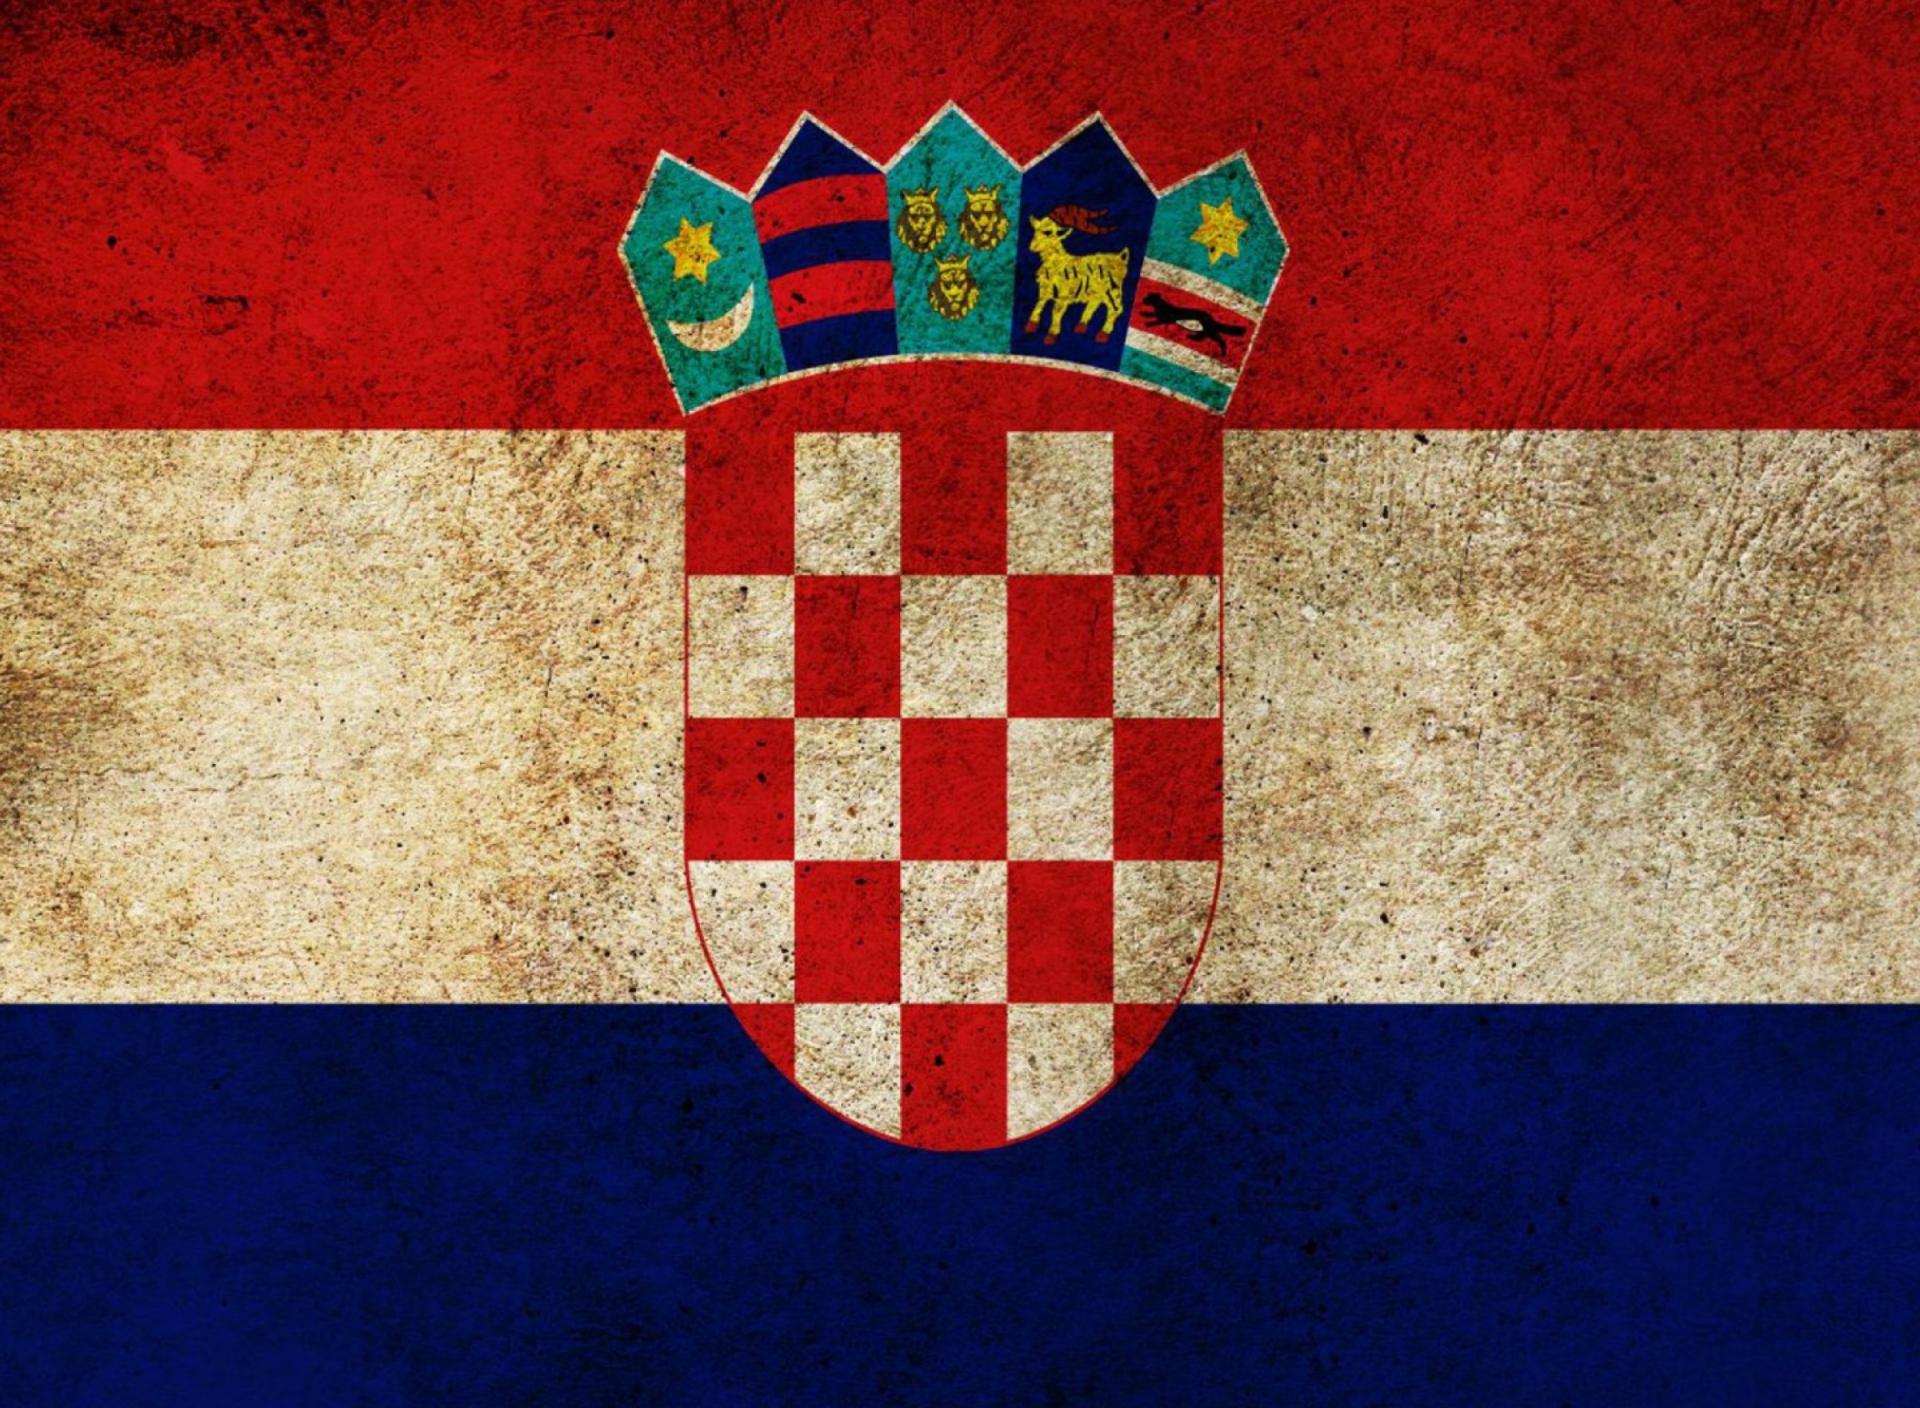 друг картинки флаги хорватии ясно знак связан